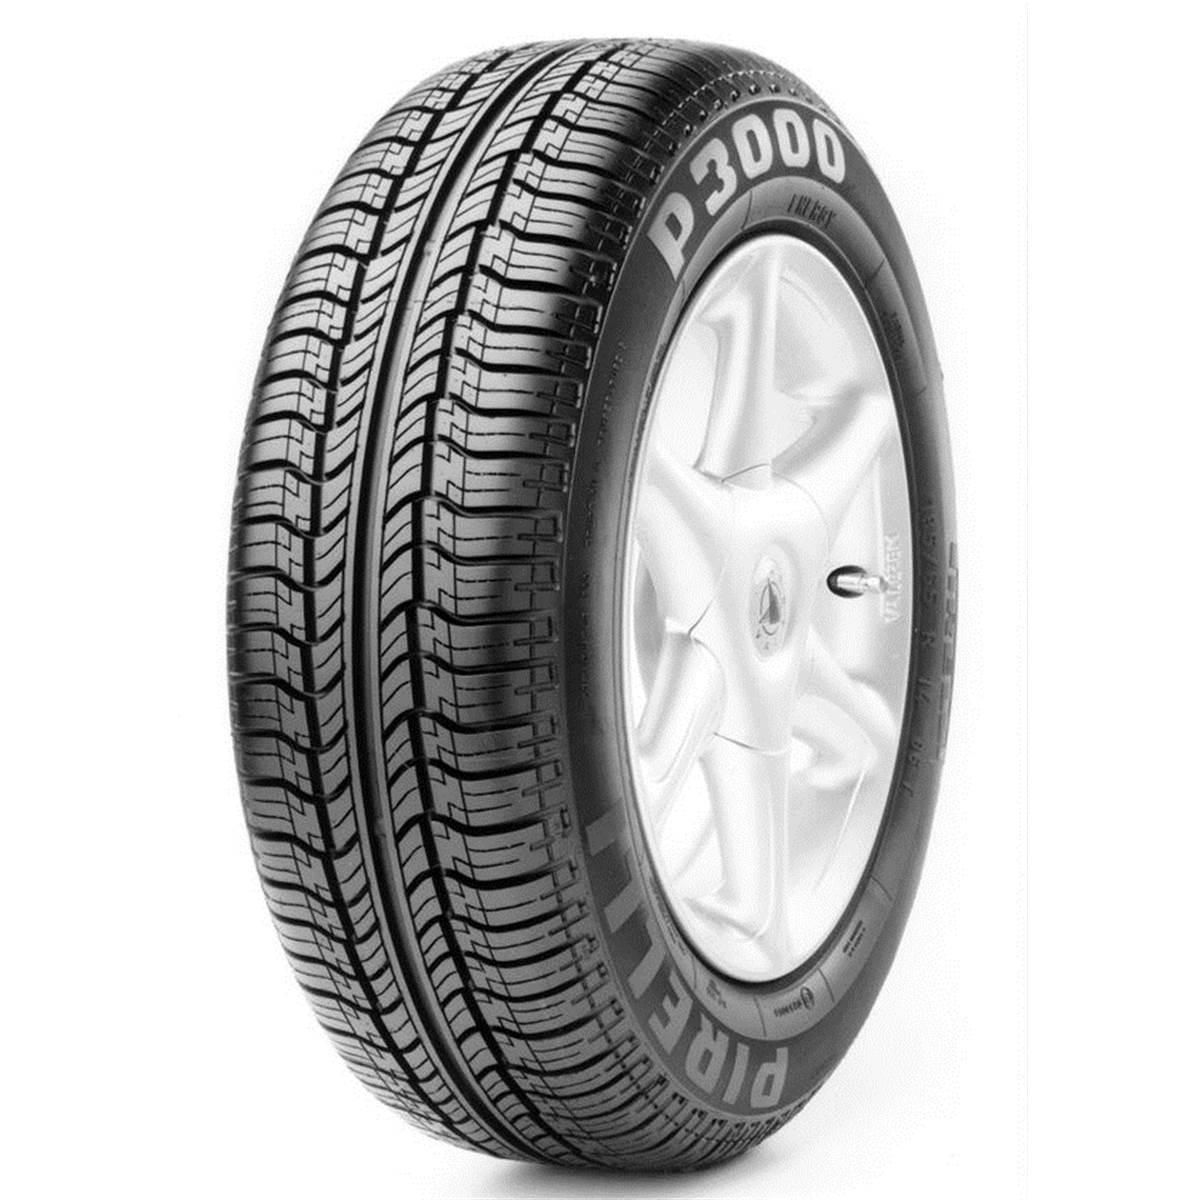 Pneu P3000 Energy Pirelli 155/80X13 79 T